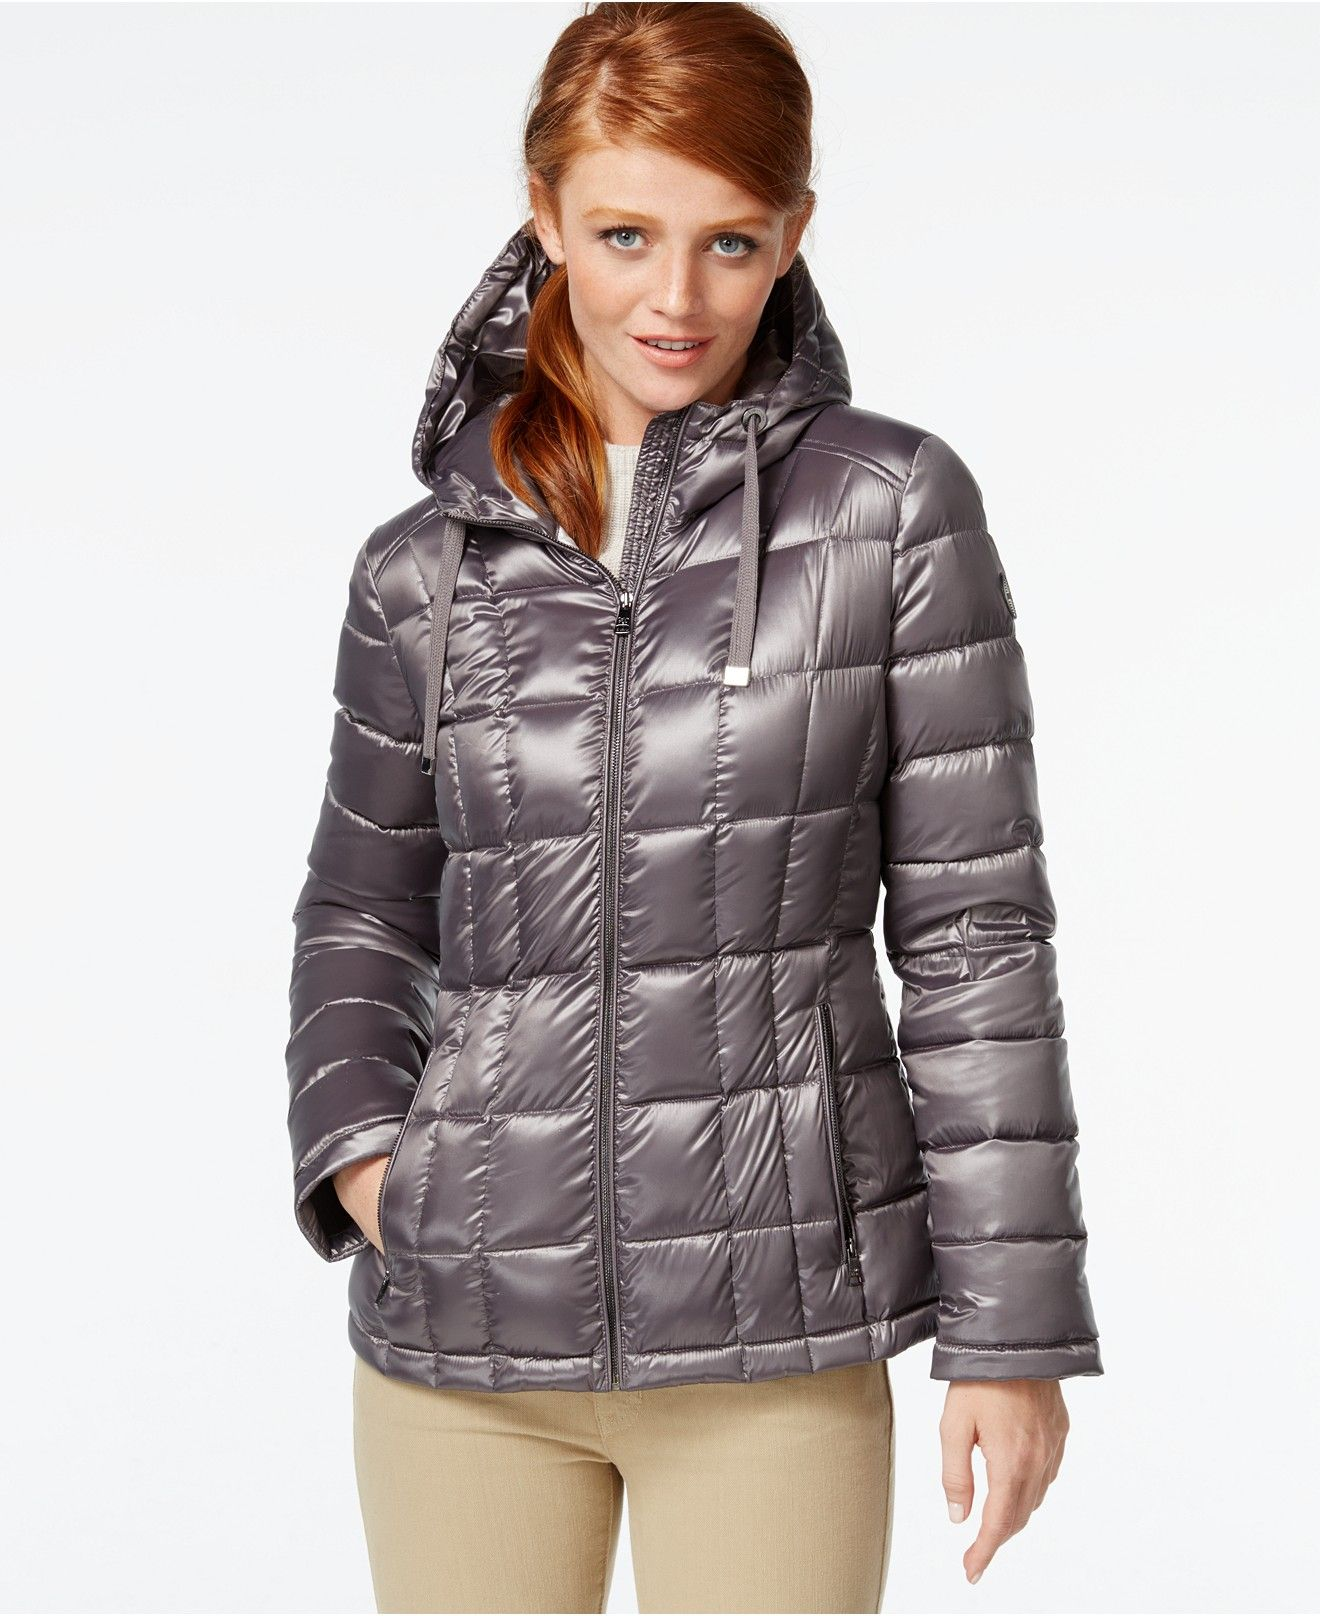 9f63a138fdb1 Calvin Klein Metallic Packable Down Puffer Coat - Coats - Women - Macy's